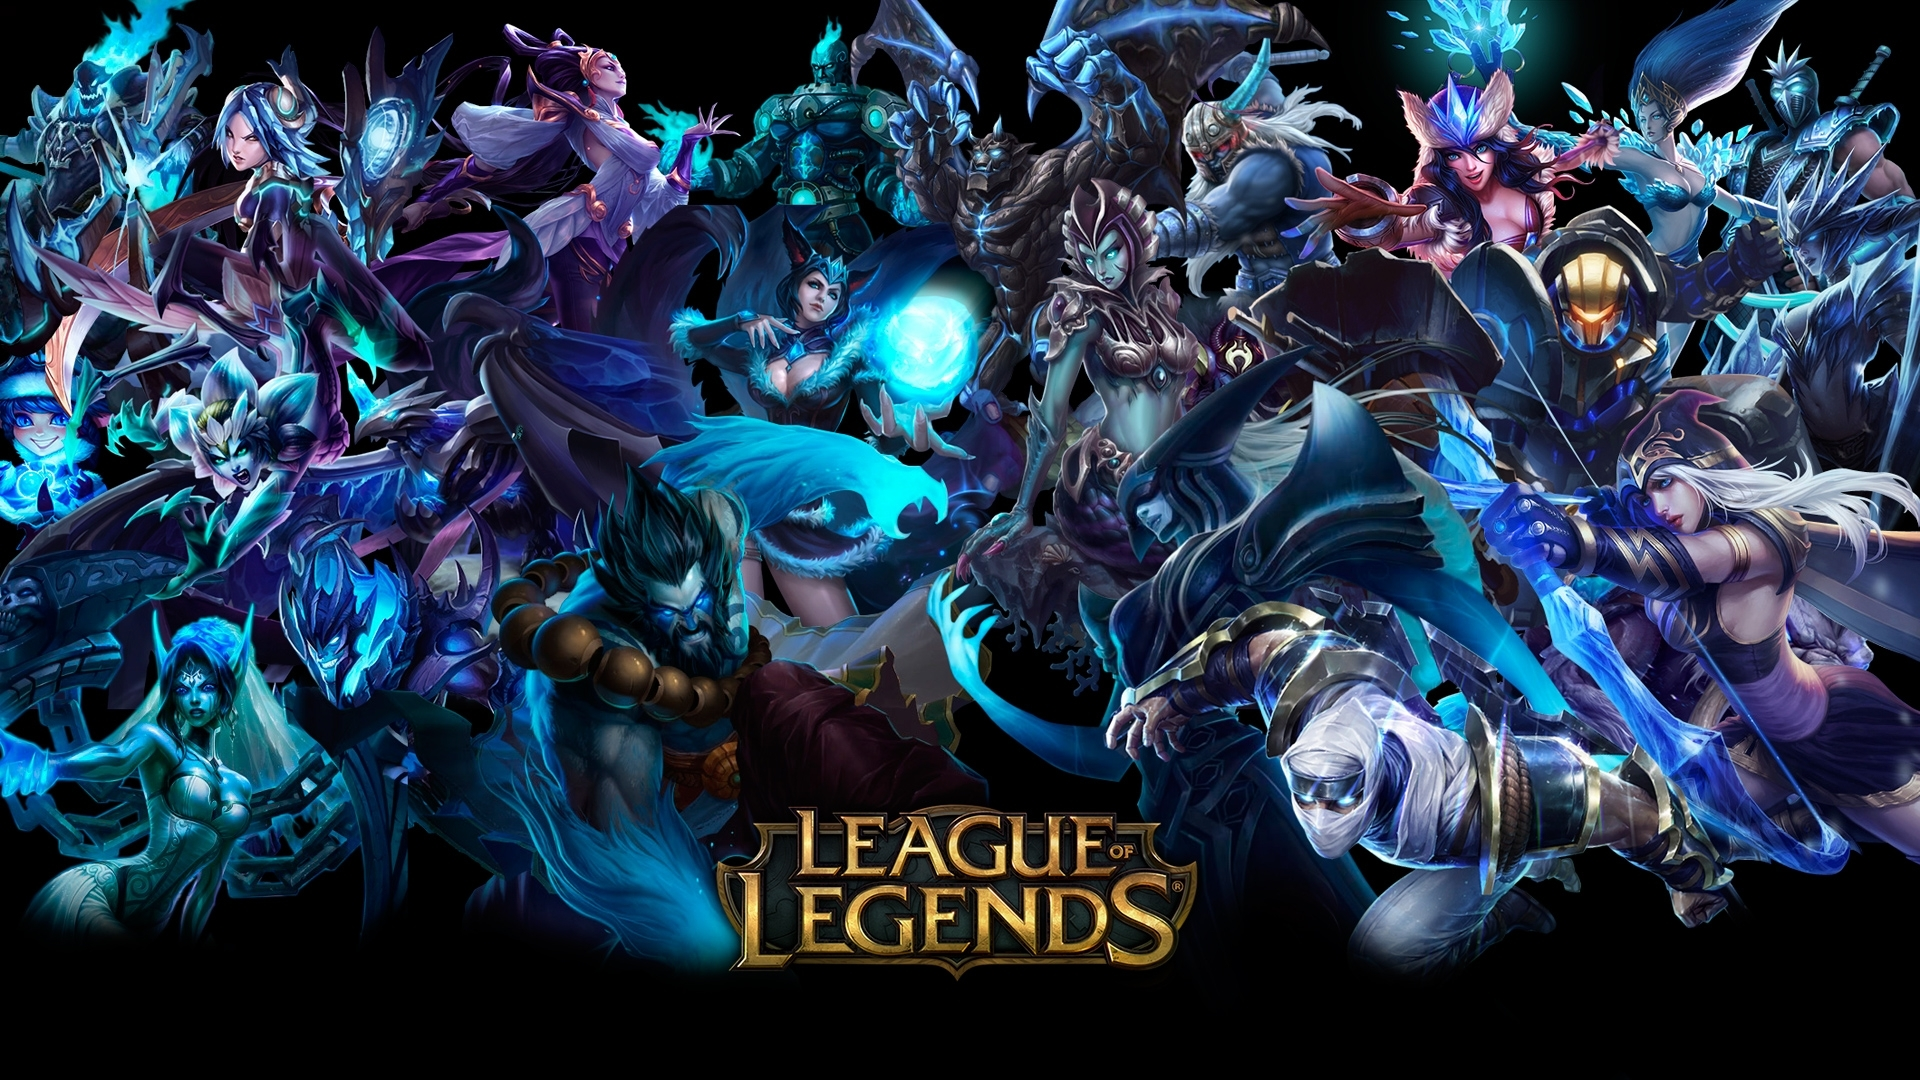 10 new league of legends 1920x1080 hd wallpaper full hd 1920 1080